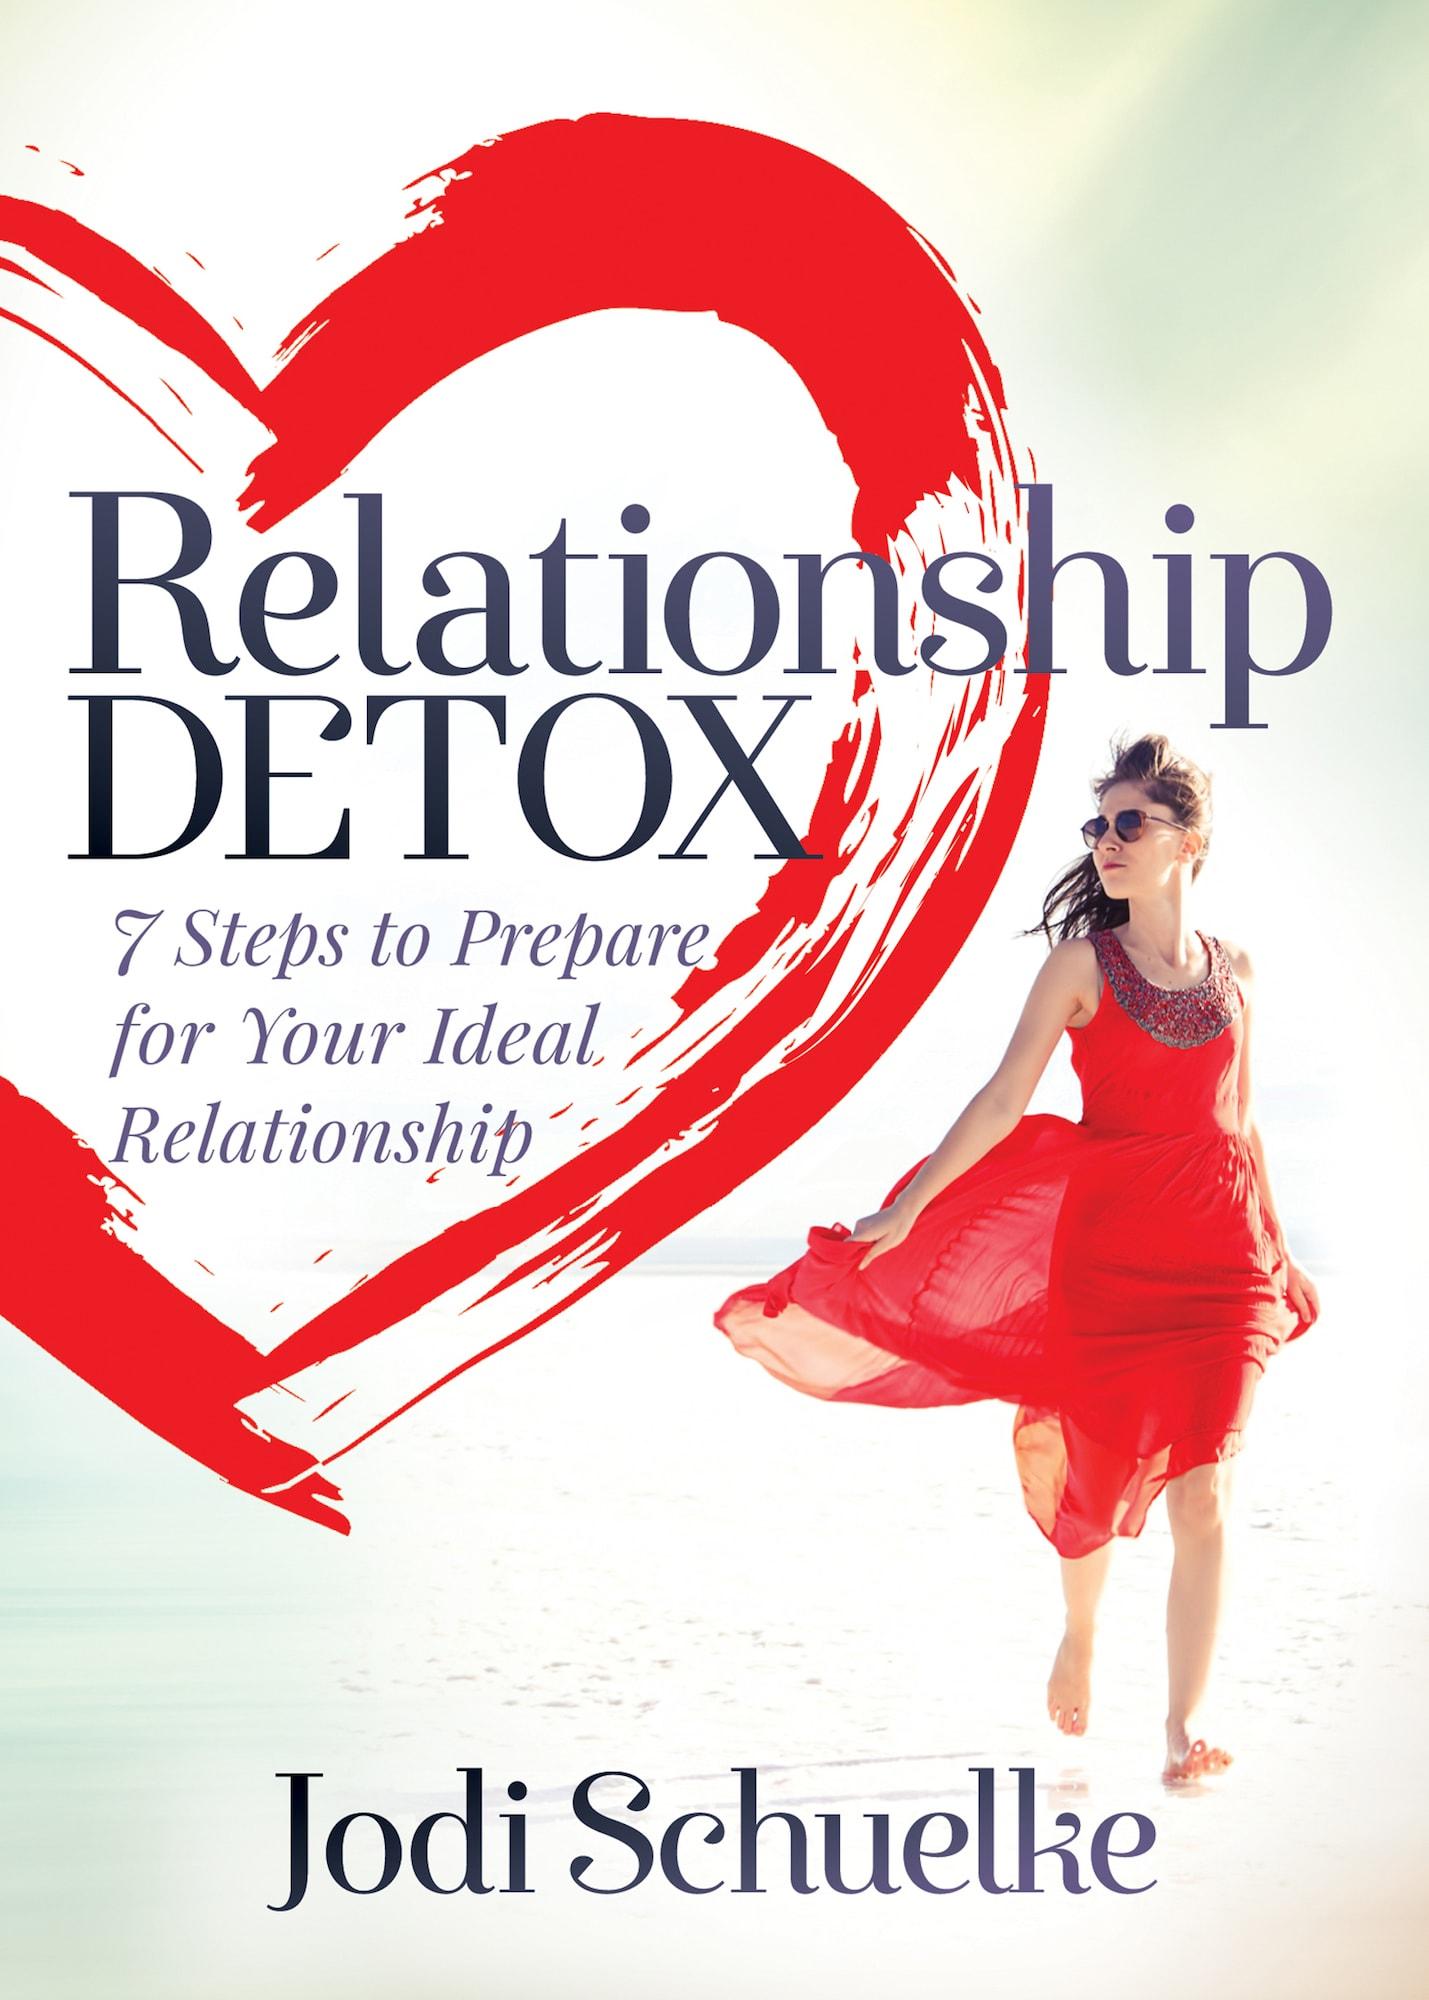 Relationship Detox, Jodi Schuelke Relationship Coach